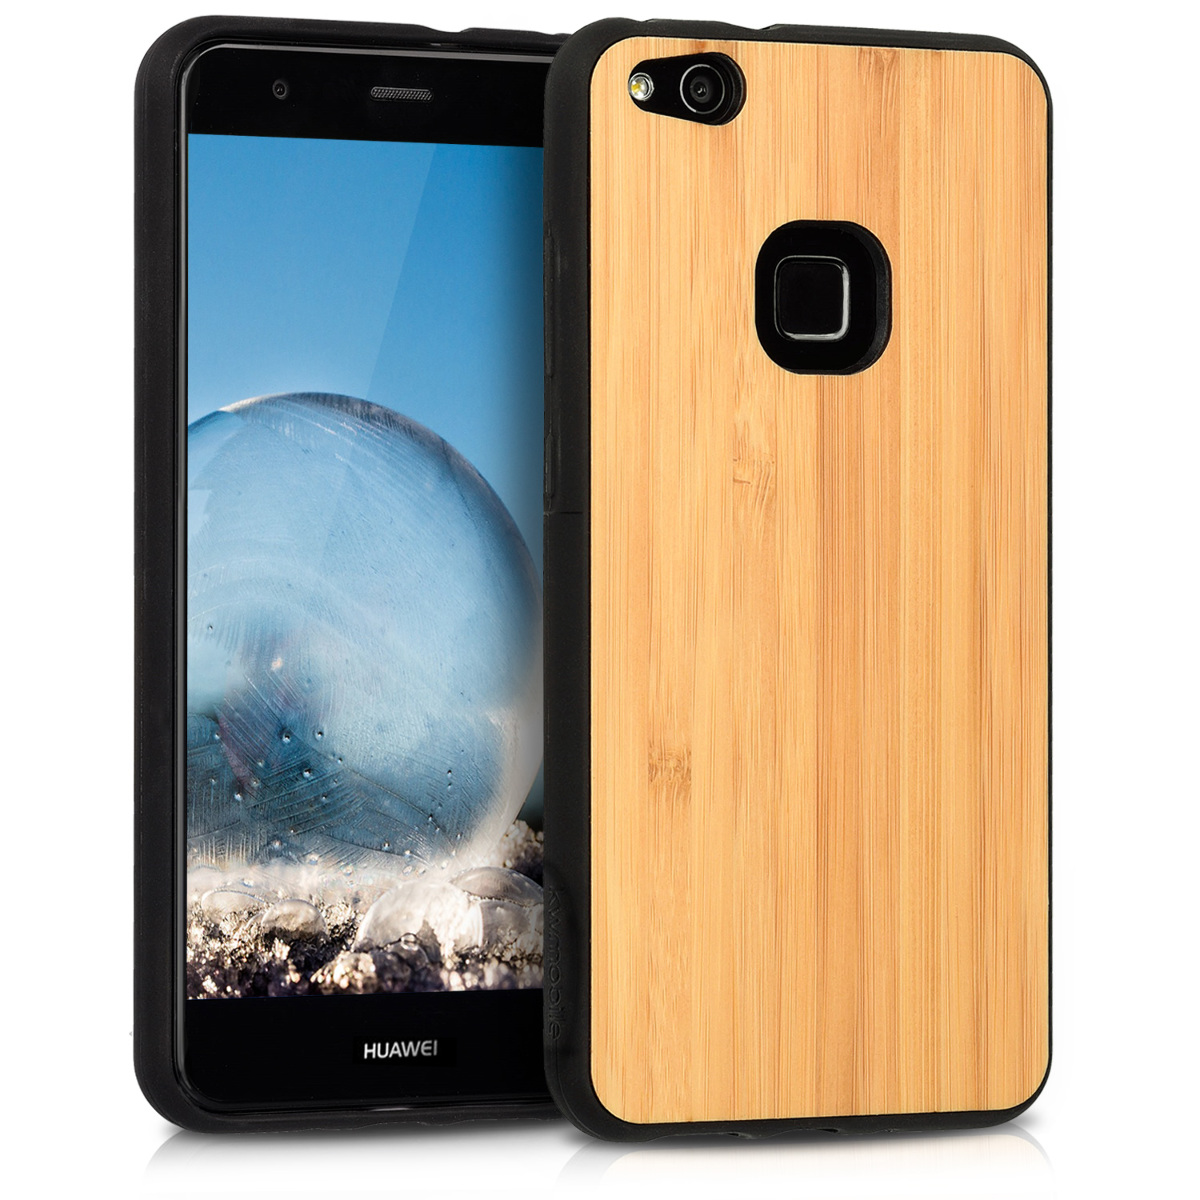 KW Ξύλινη Θήκη Huawei P10 Lite -  bamboo - Light Brown - (41376.24)